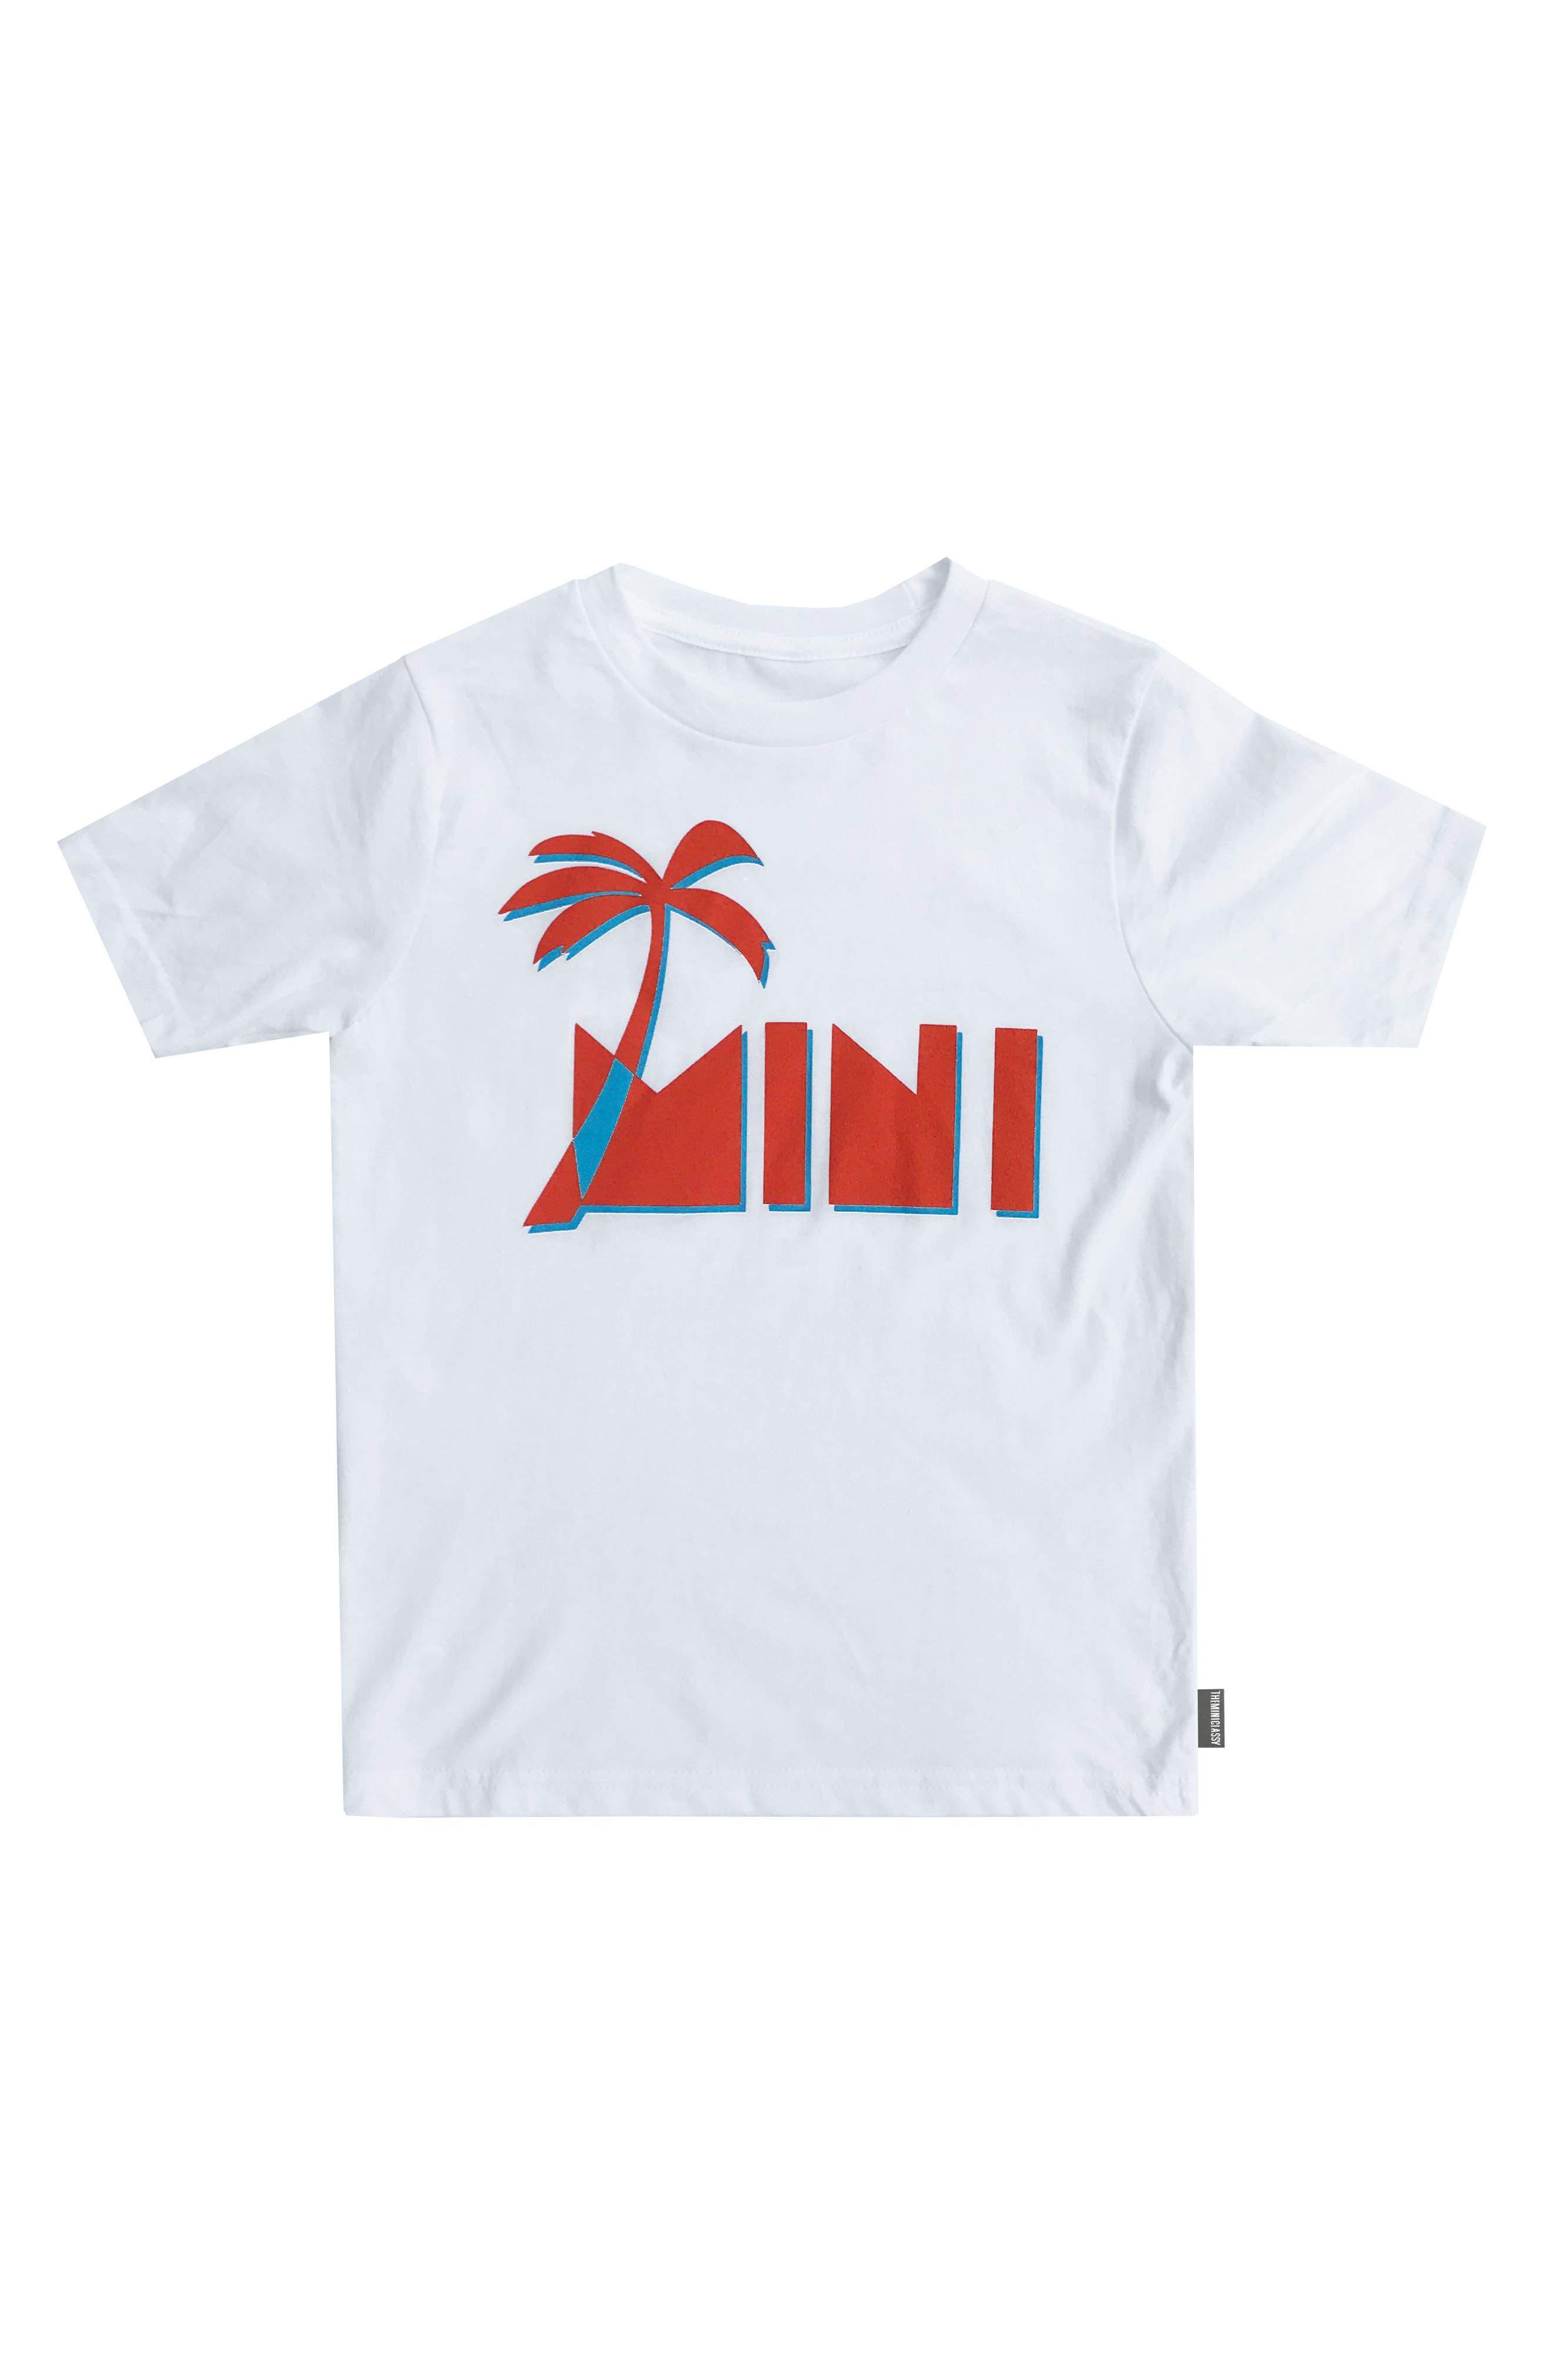 THEMINICLASSY Graphic Crewneck T-Shirt